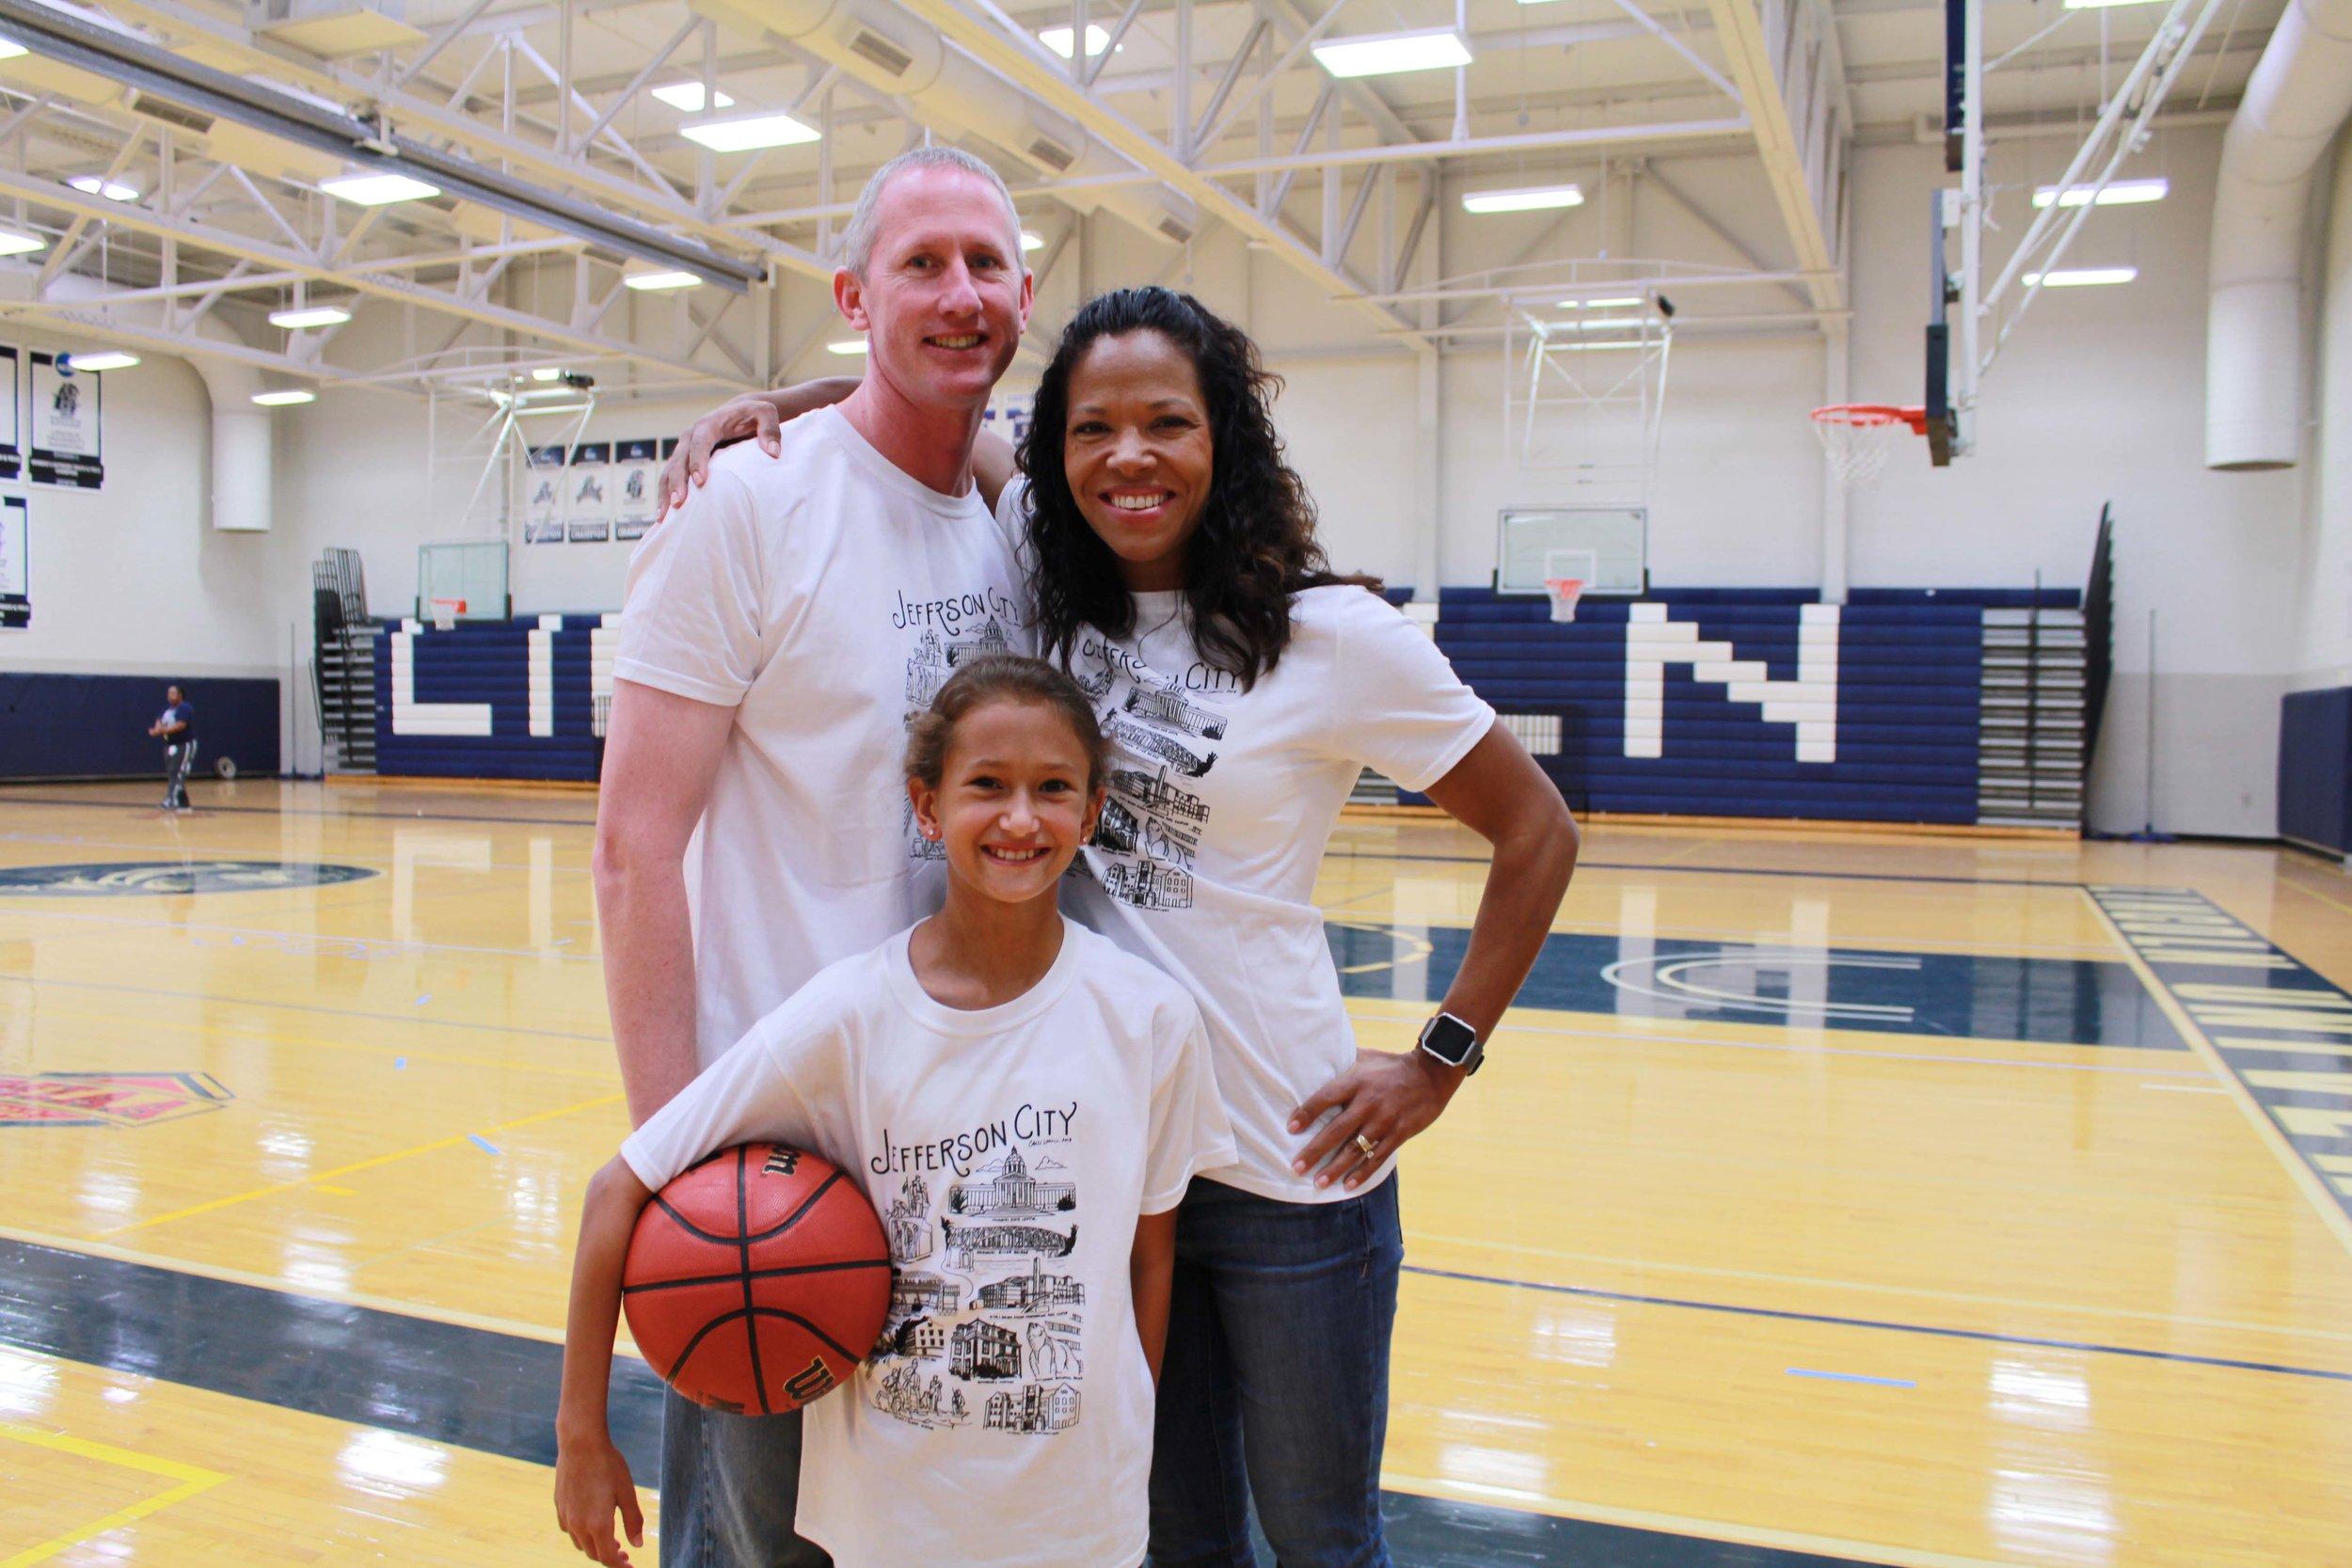 Coach-John-Moseley-Lincoln-University-Jefferson-City-Missouri-jeff-city-blog-mo-swag